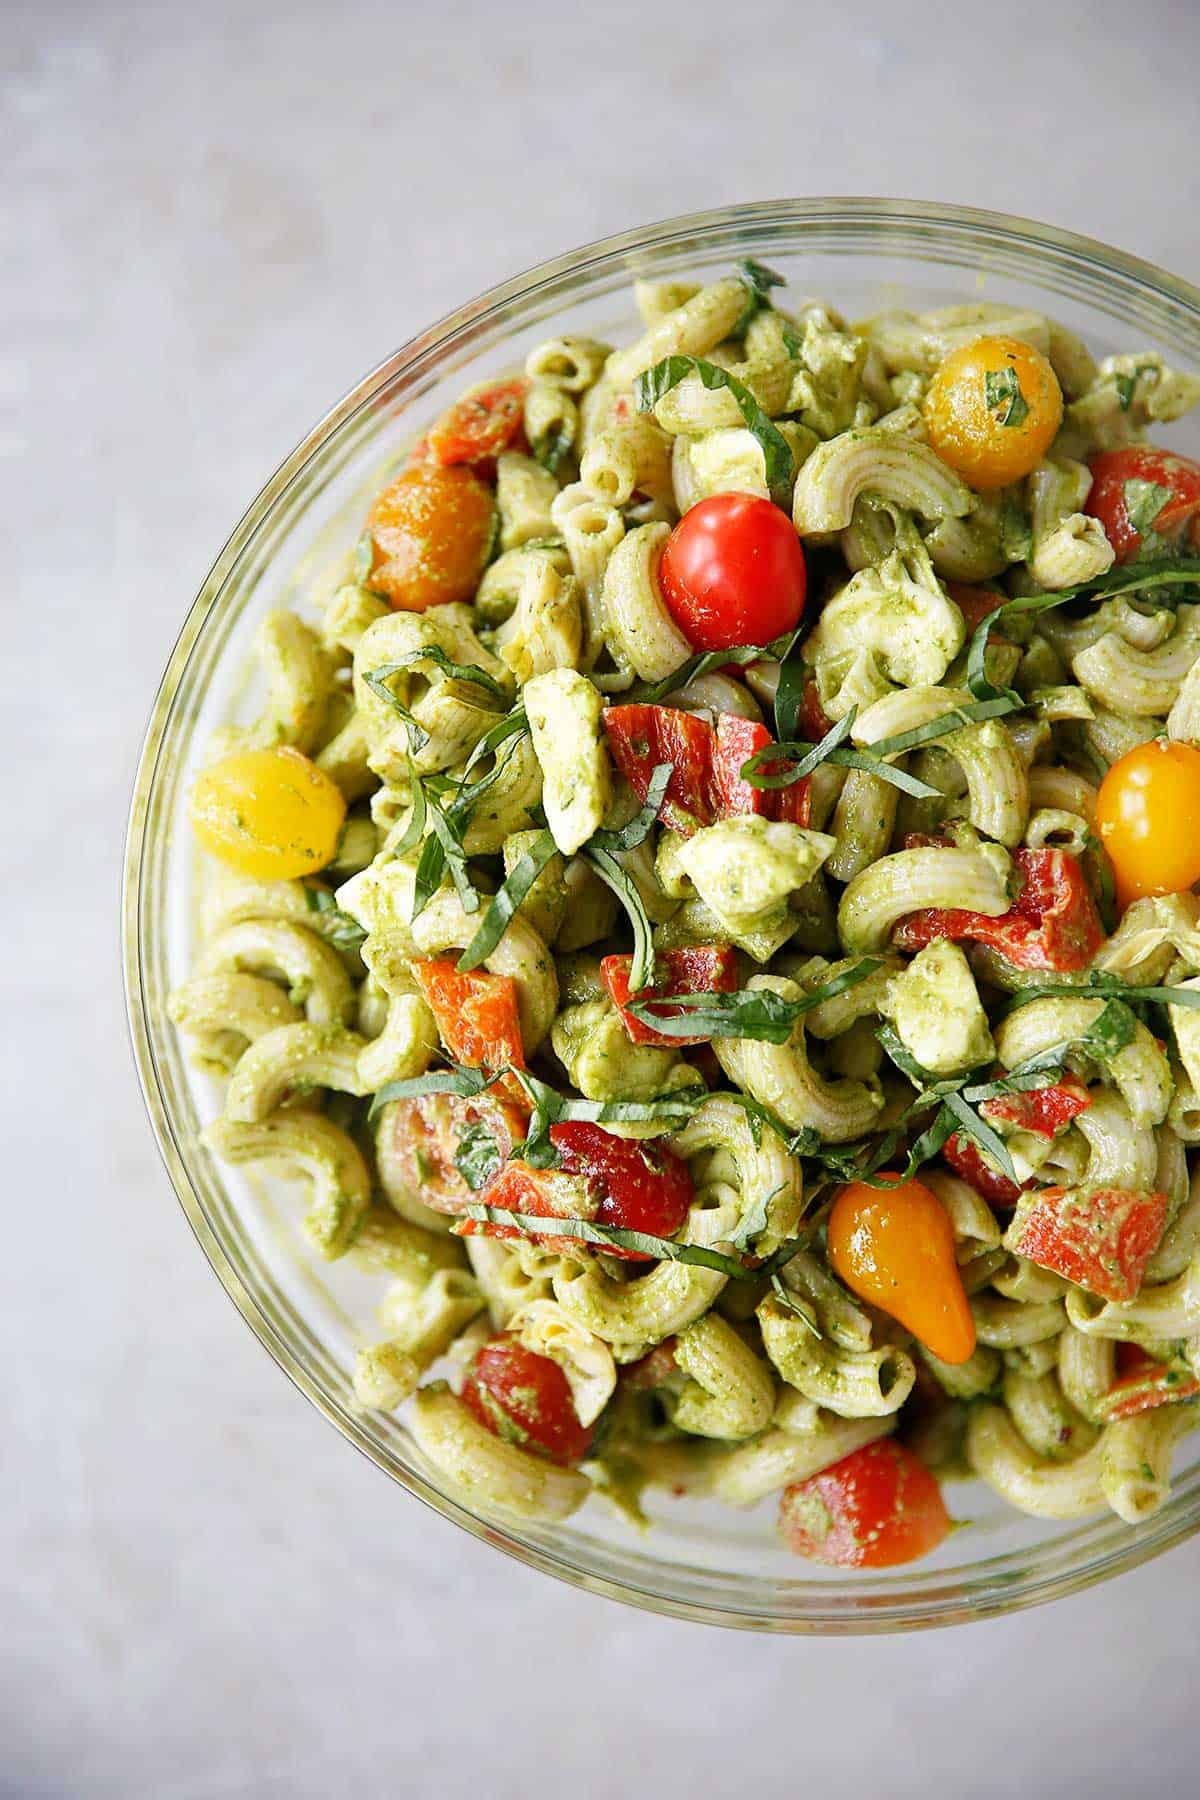 A bowl of caprese pesto pasta salad.